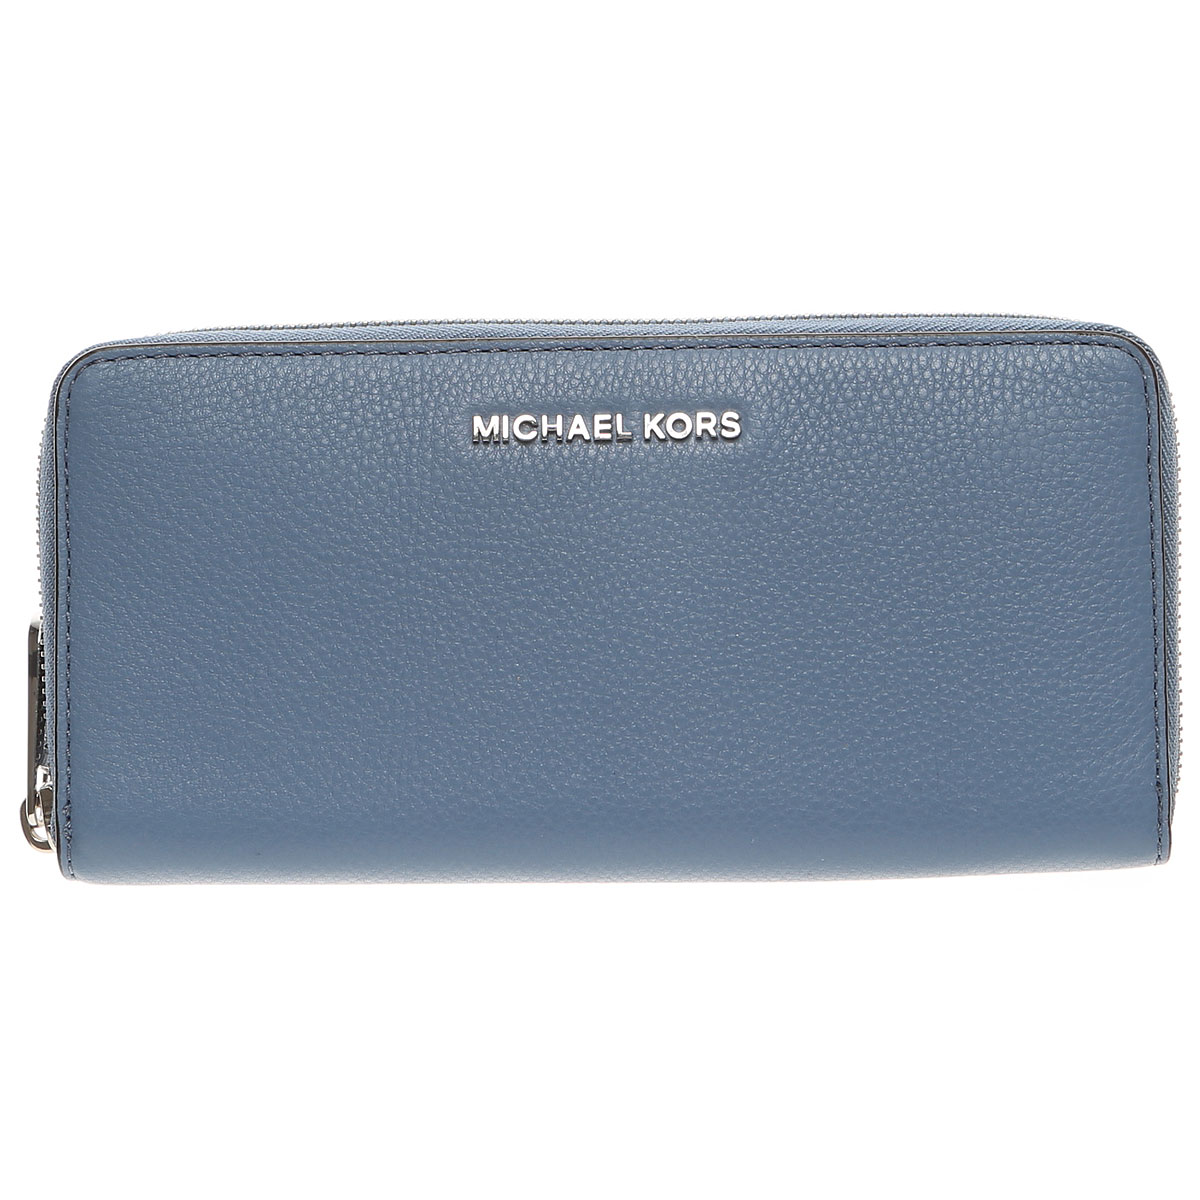 Michael Kors Wallet for Women On Sale, Denim Blue, Leather, 2019